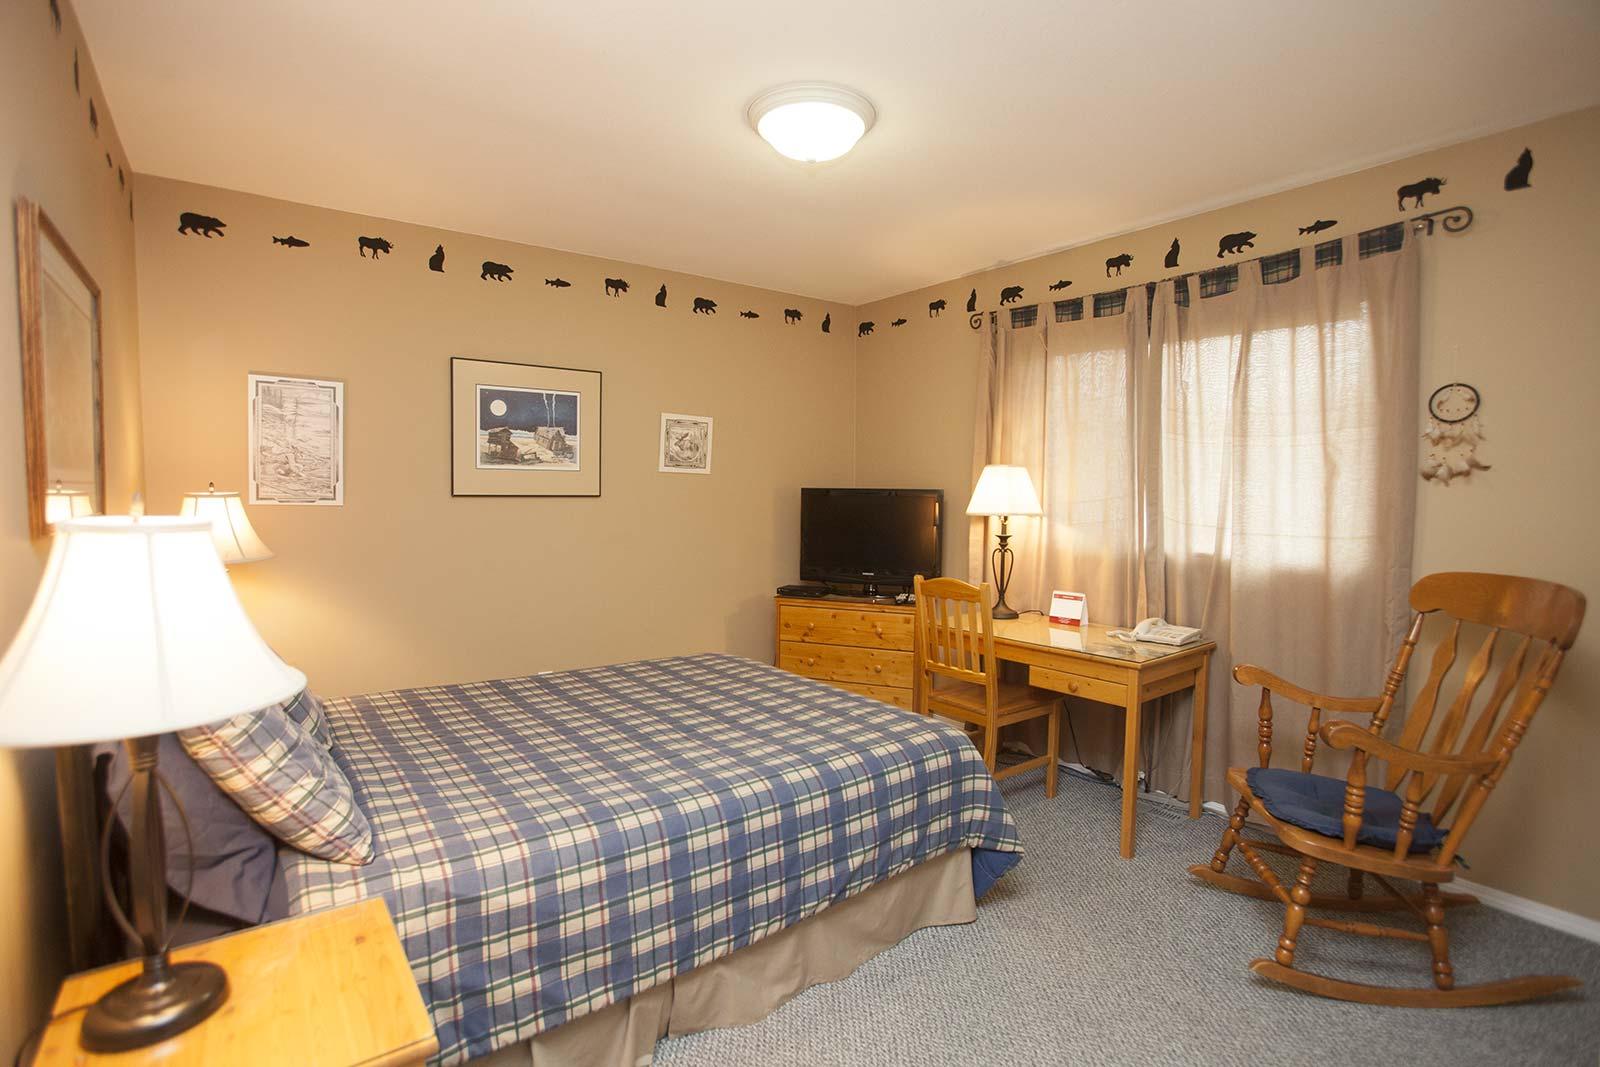 Inn / Hotel Rooms